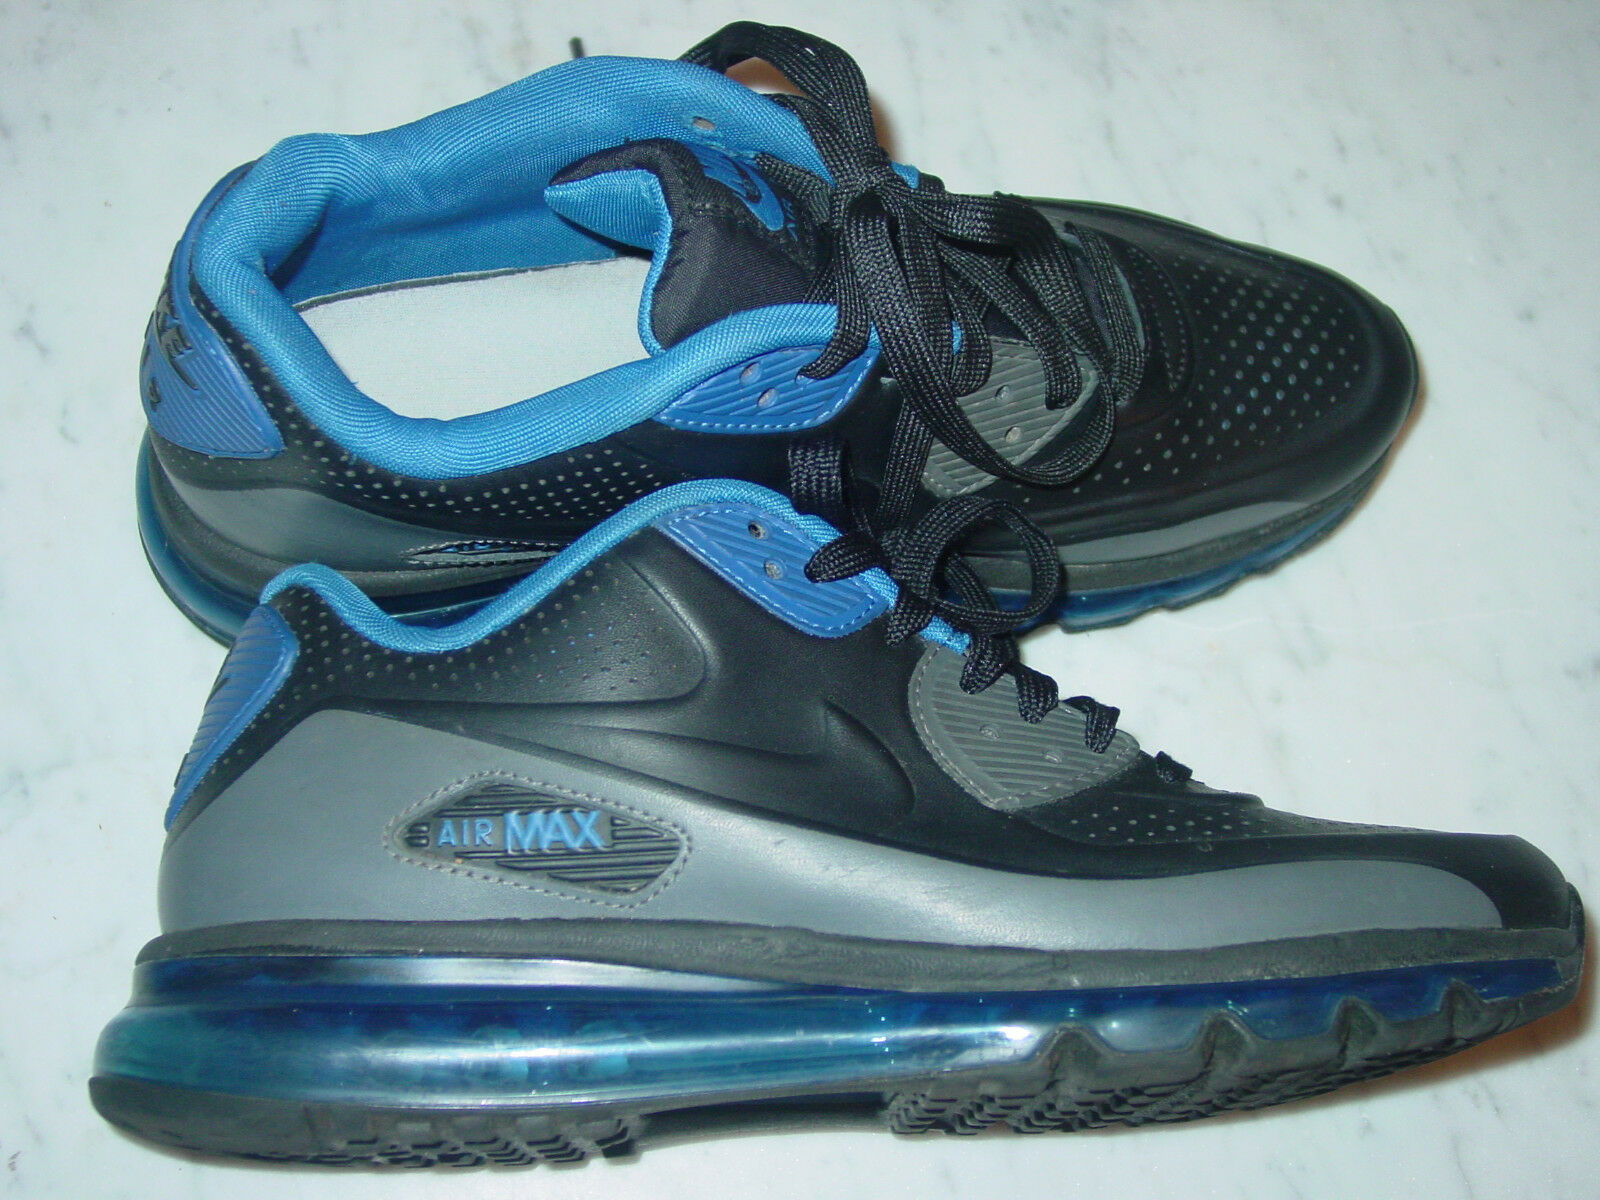 2014 Mens Nike Air Max 90 2014 LTR QS BlackBlue Running Shoes! Size 9